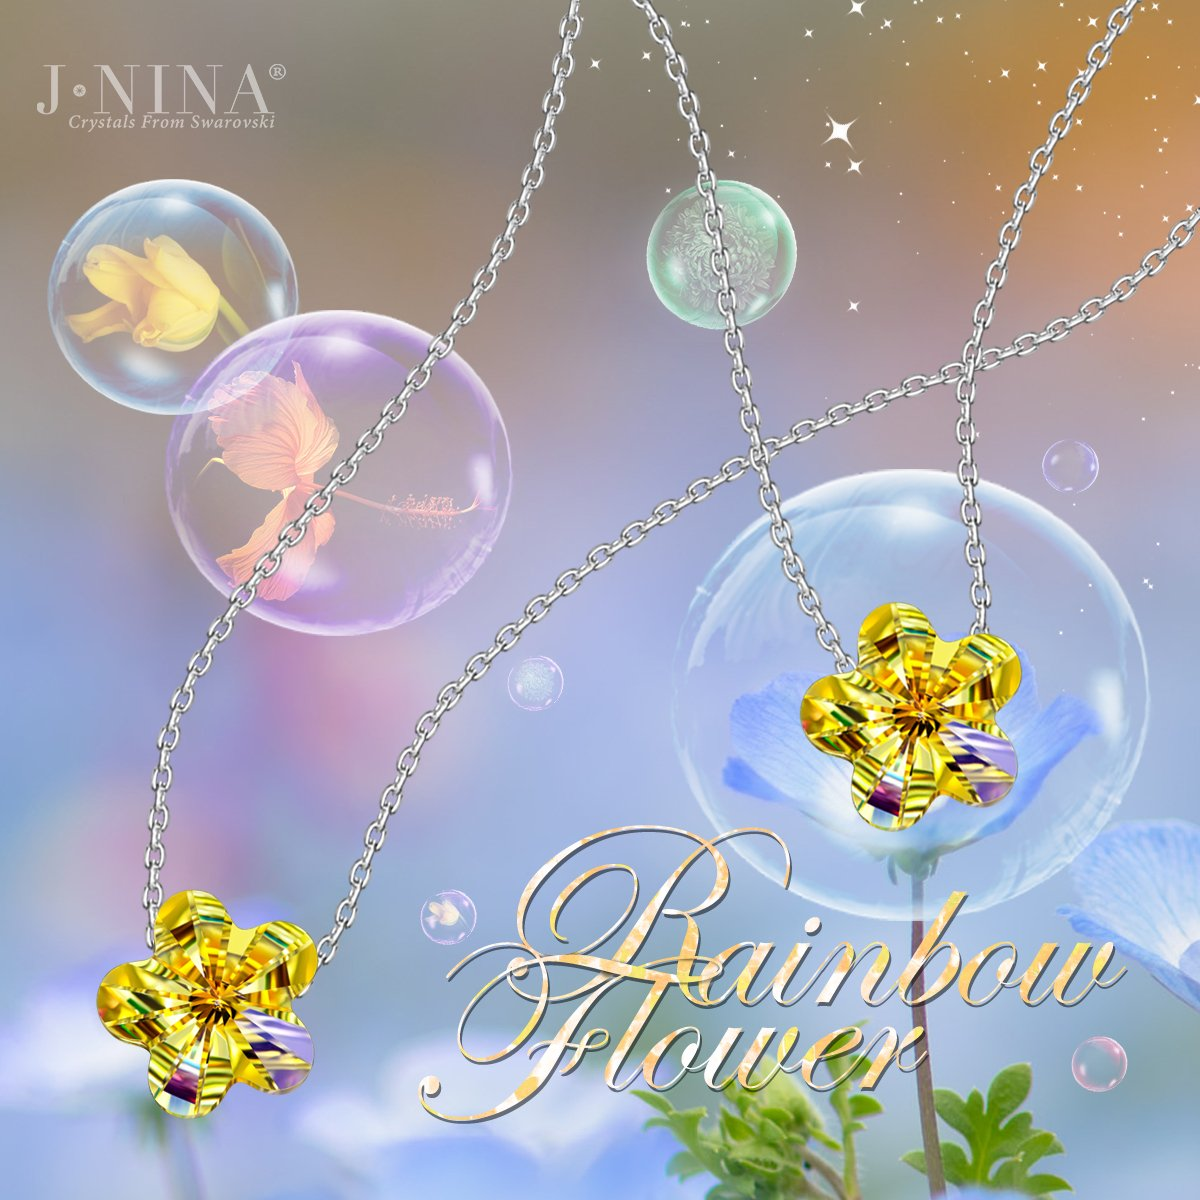 Amazon.com: J.NINA 925 Sterling Silver Rainbow Flower Chain with Aurora  Borealis Crystals from Swarovski, Lucky Pendant Necklace Birthday  Anniversary ...